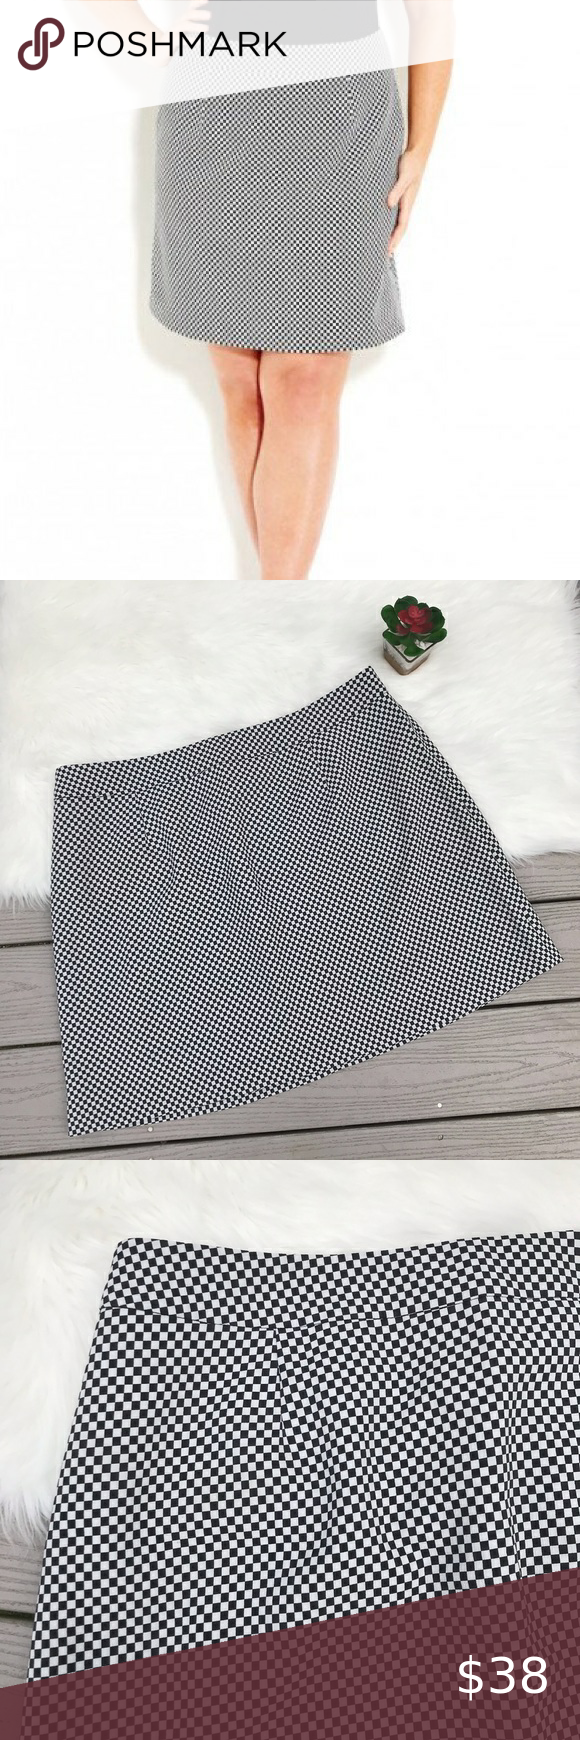 Vintage Radical 80s Print Skirt By Robyn Fits Medium